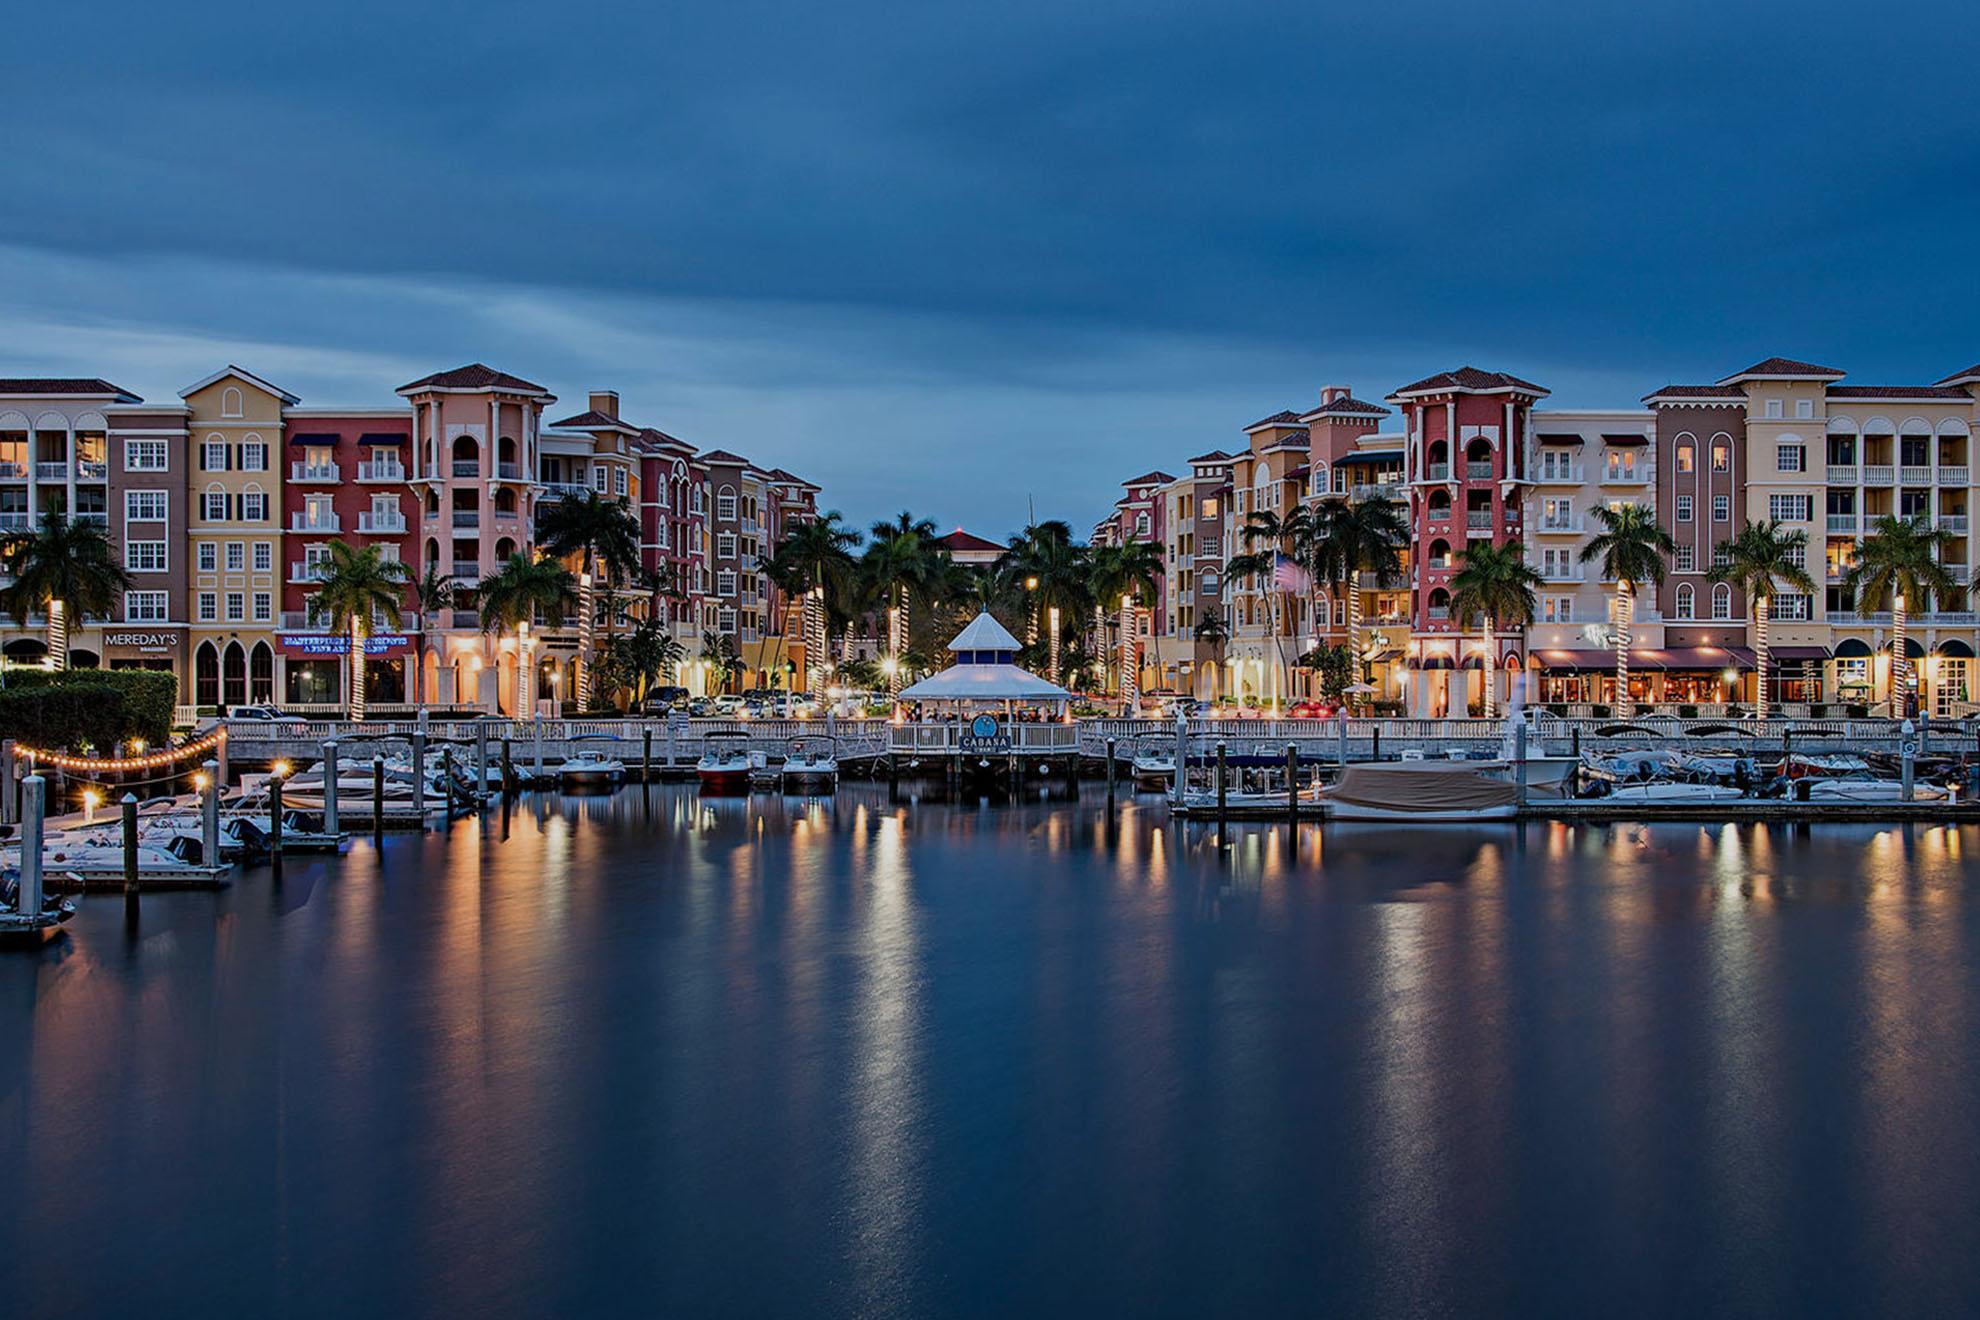 Bayfront Inn Th Ave Naples Downtown Hotel Naples Fl